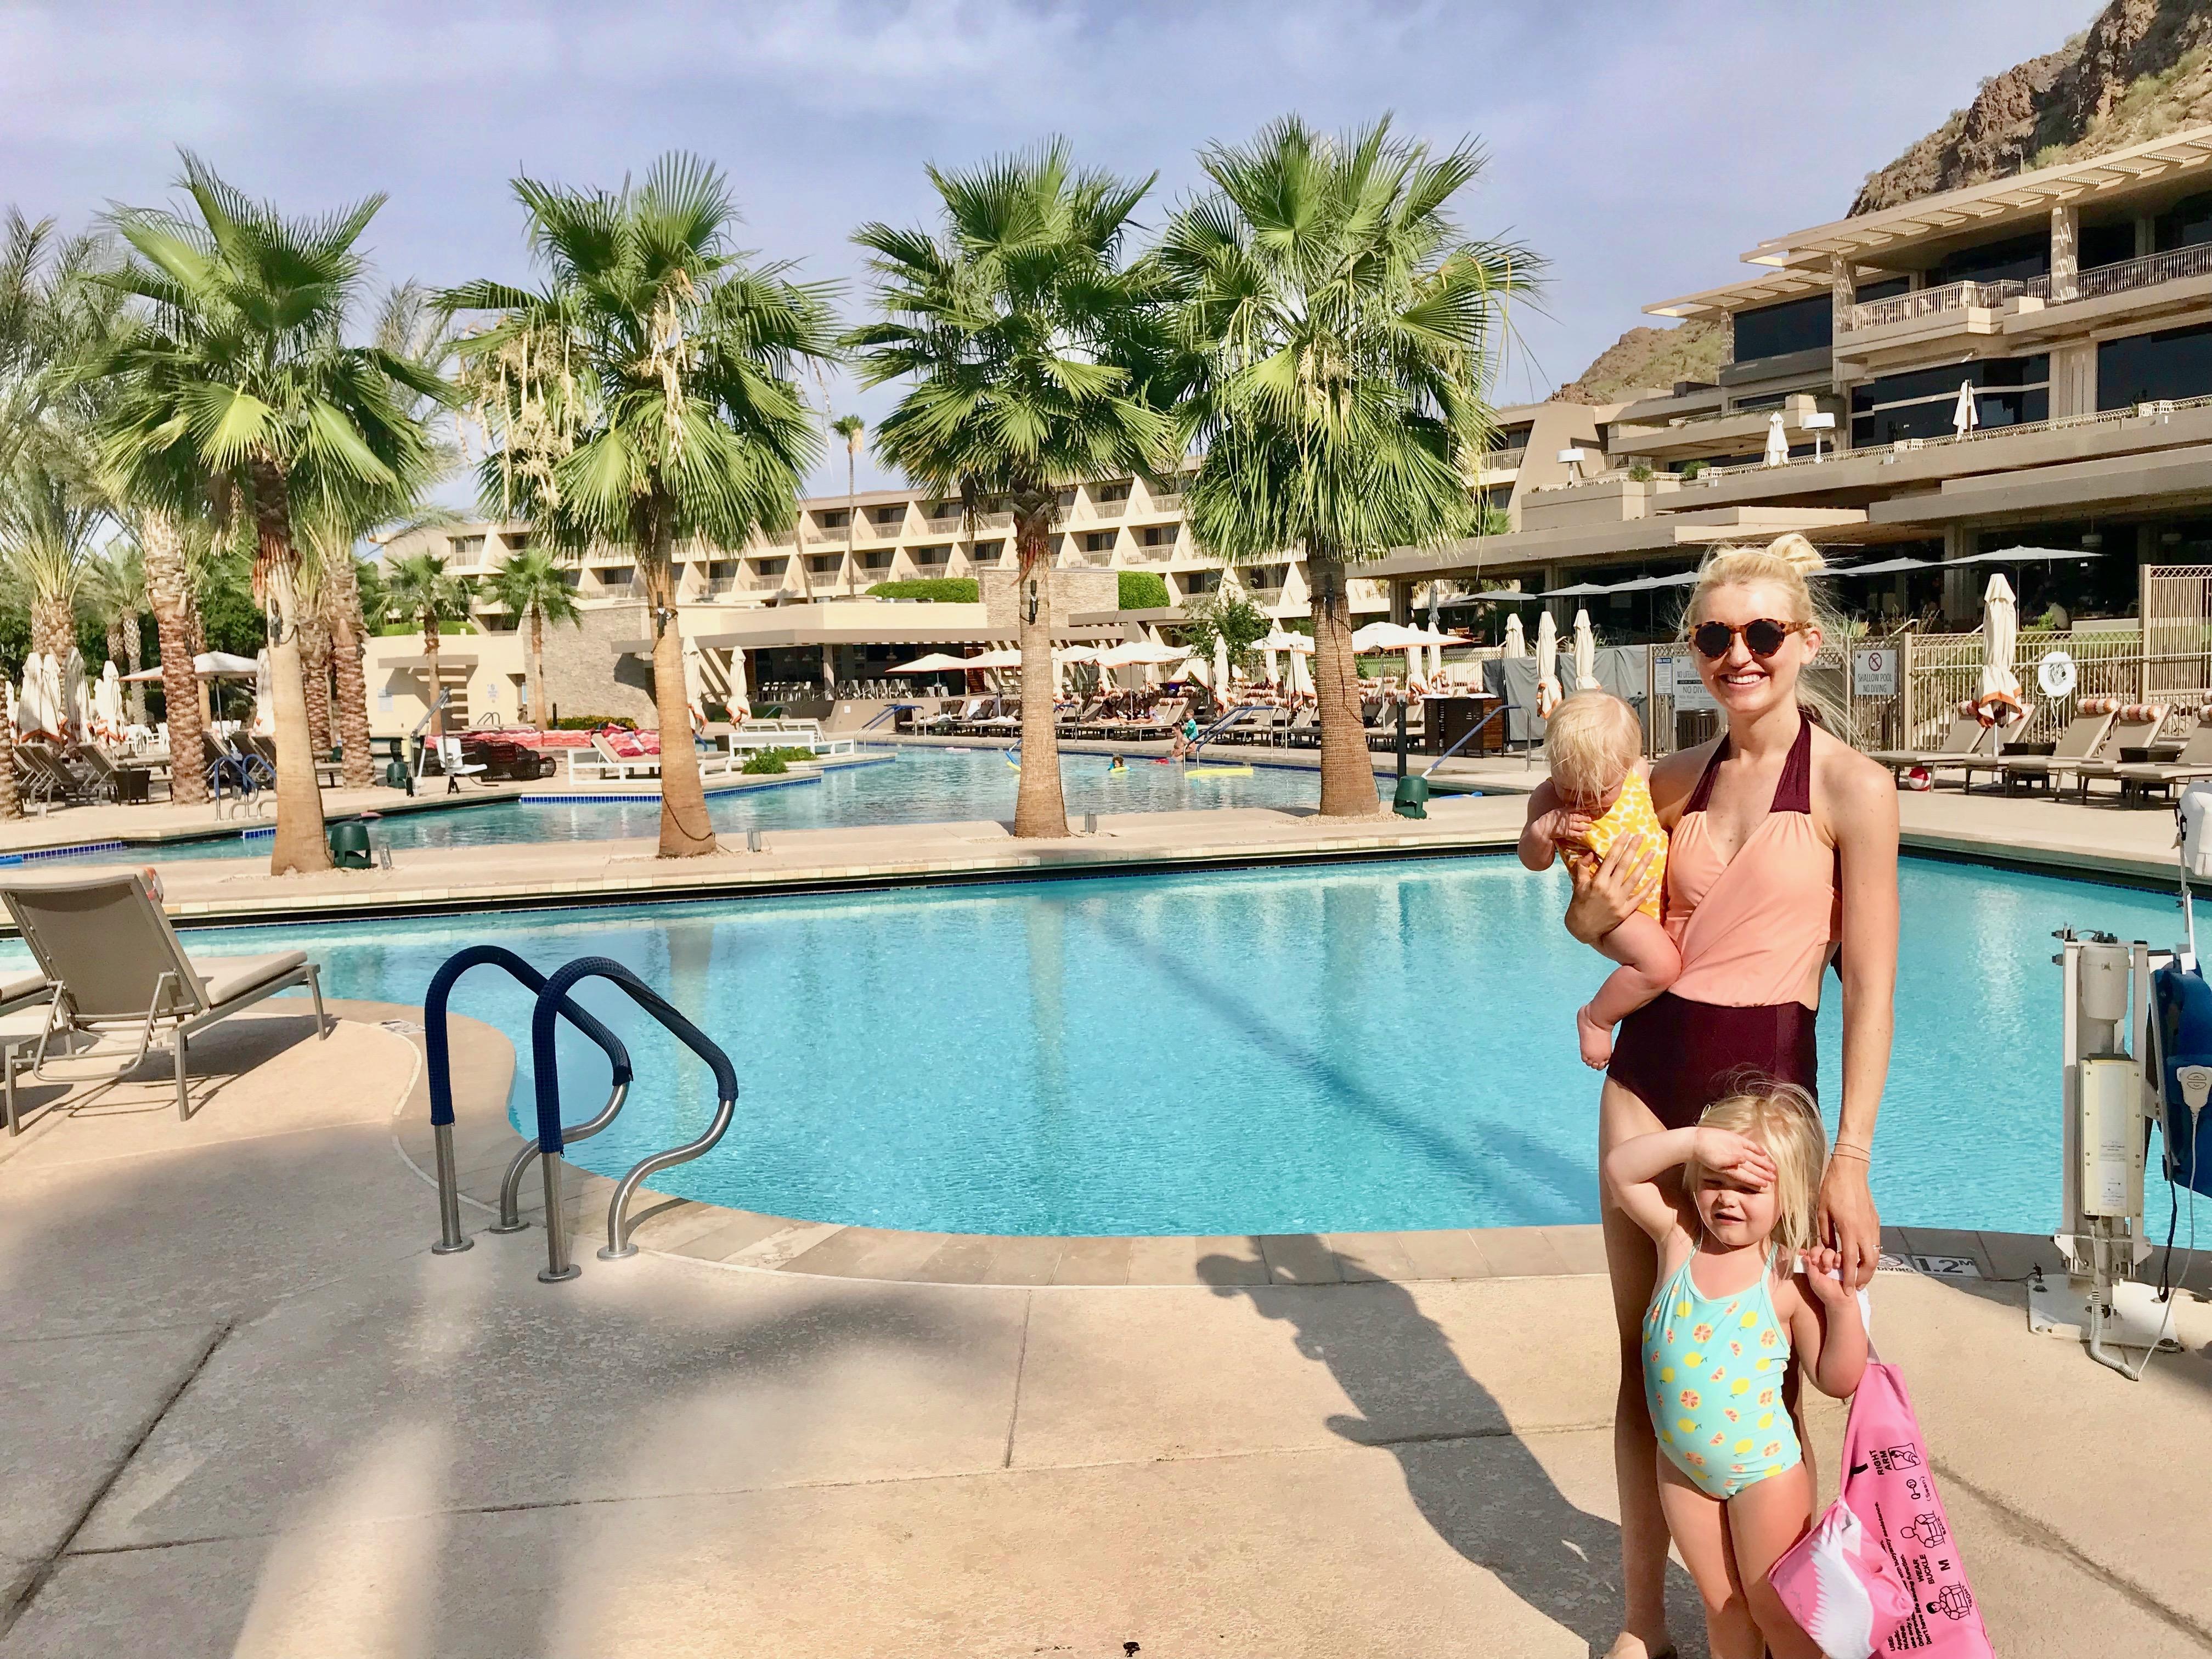 scottsdale arizona getaway (and guide!)